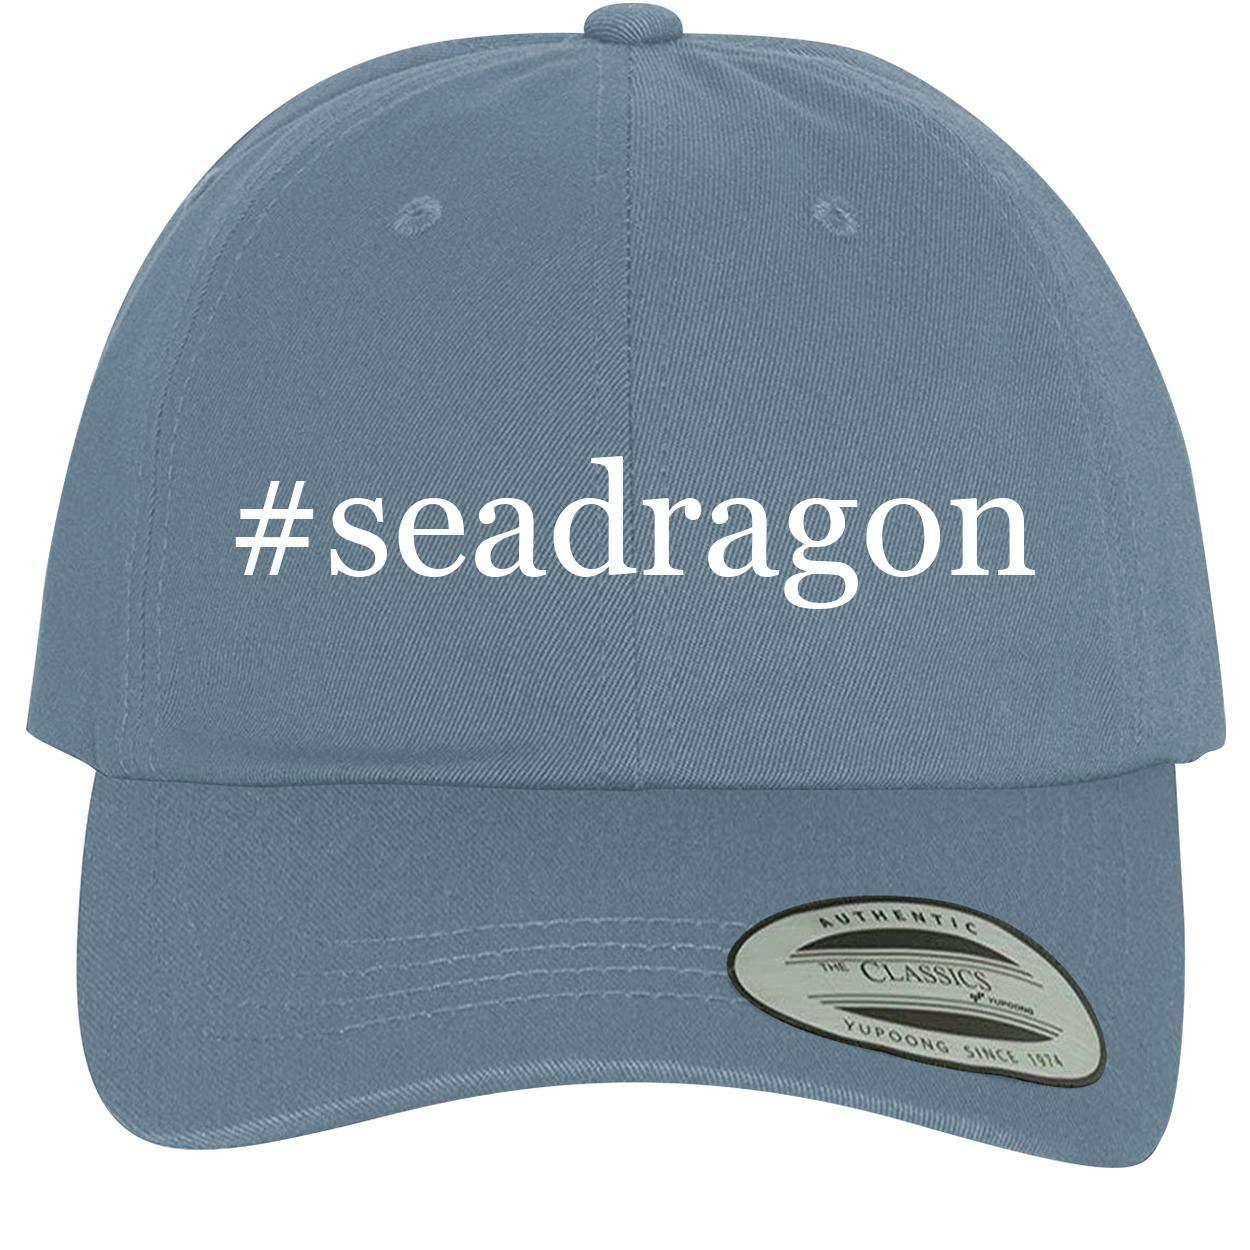 Comfortable Dad Hat Baseball Cap BH Cool Designs #Seadragon